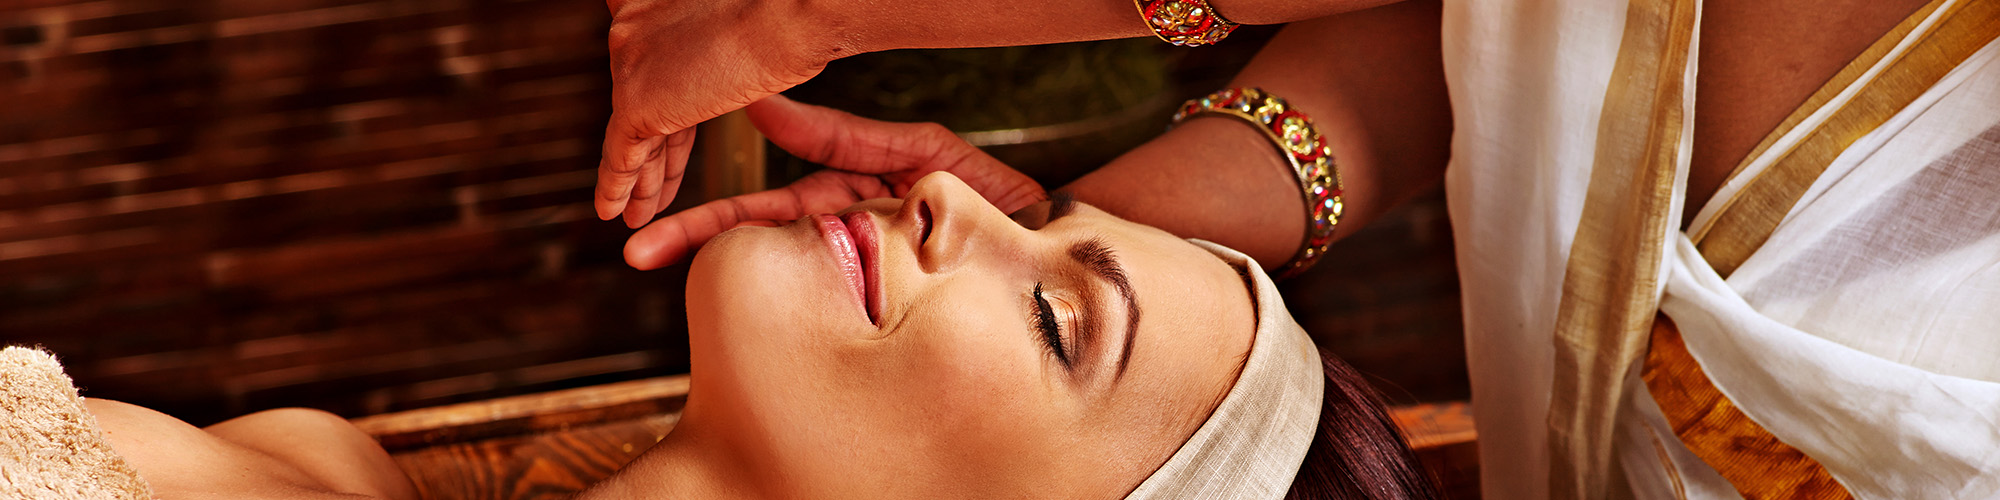 Ayurveda-Gesichtsbehandlung-Sri-Lanka